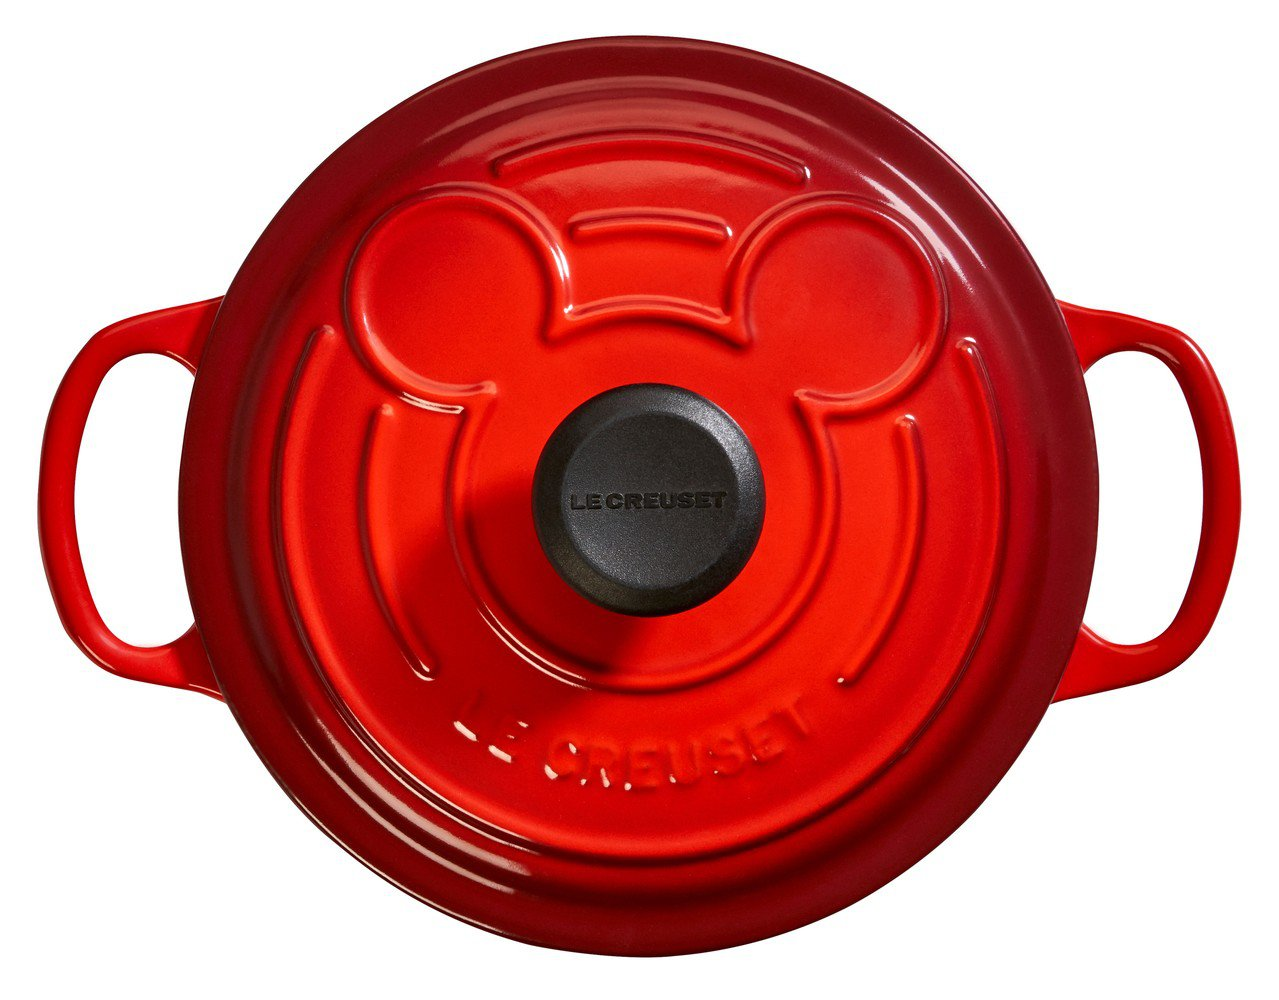 Mickey Mouse典藏圓鐵鍋18cm,鍋蓋上浮雕了大大米奇頭像。圖/Le ...